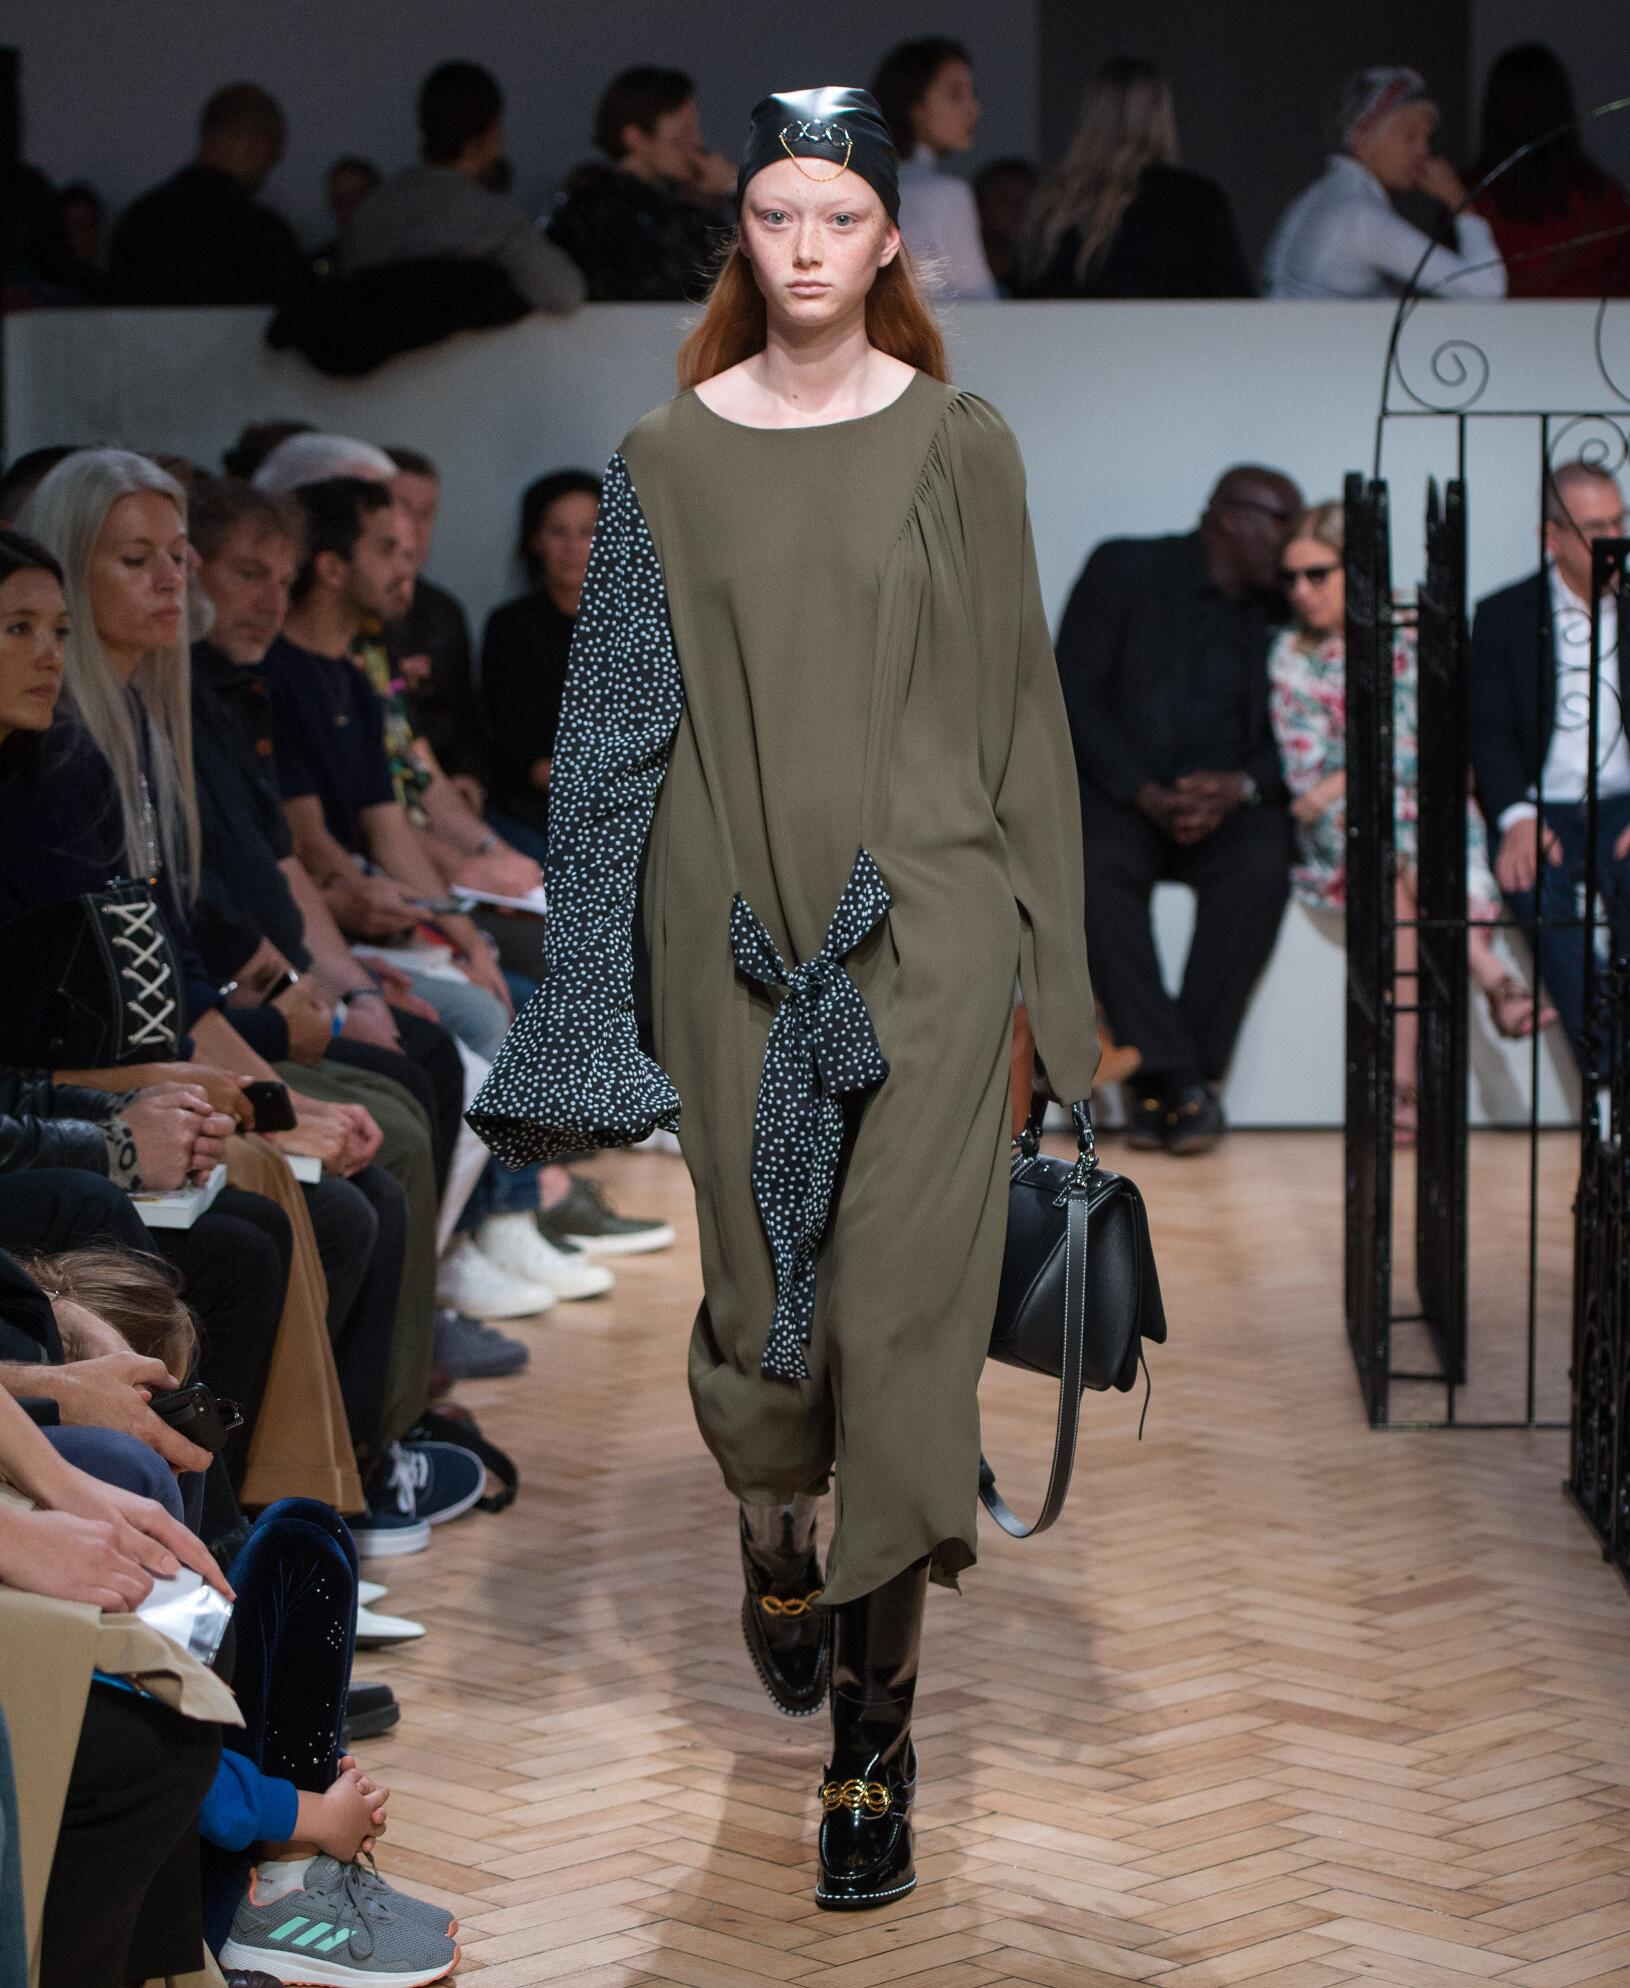 Catwalk J.W. Anderson Woman Fashion Show Summer 2019